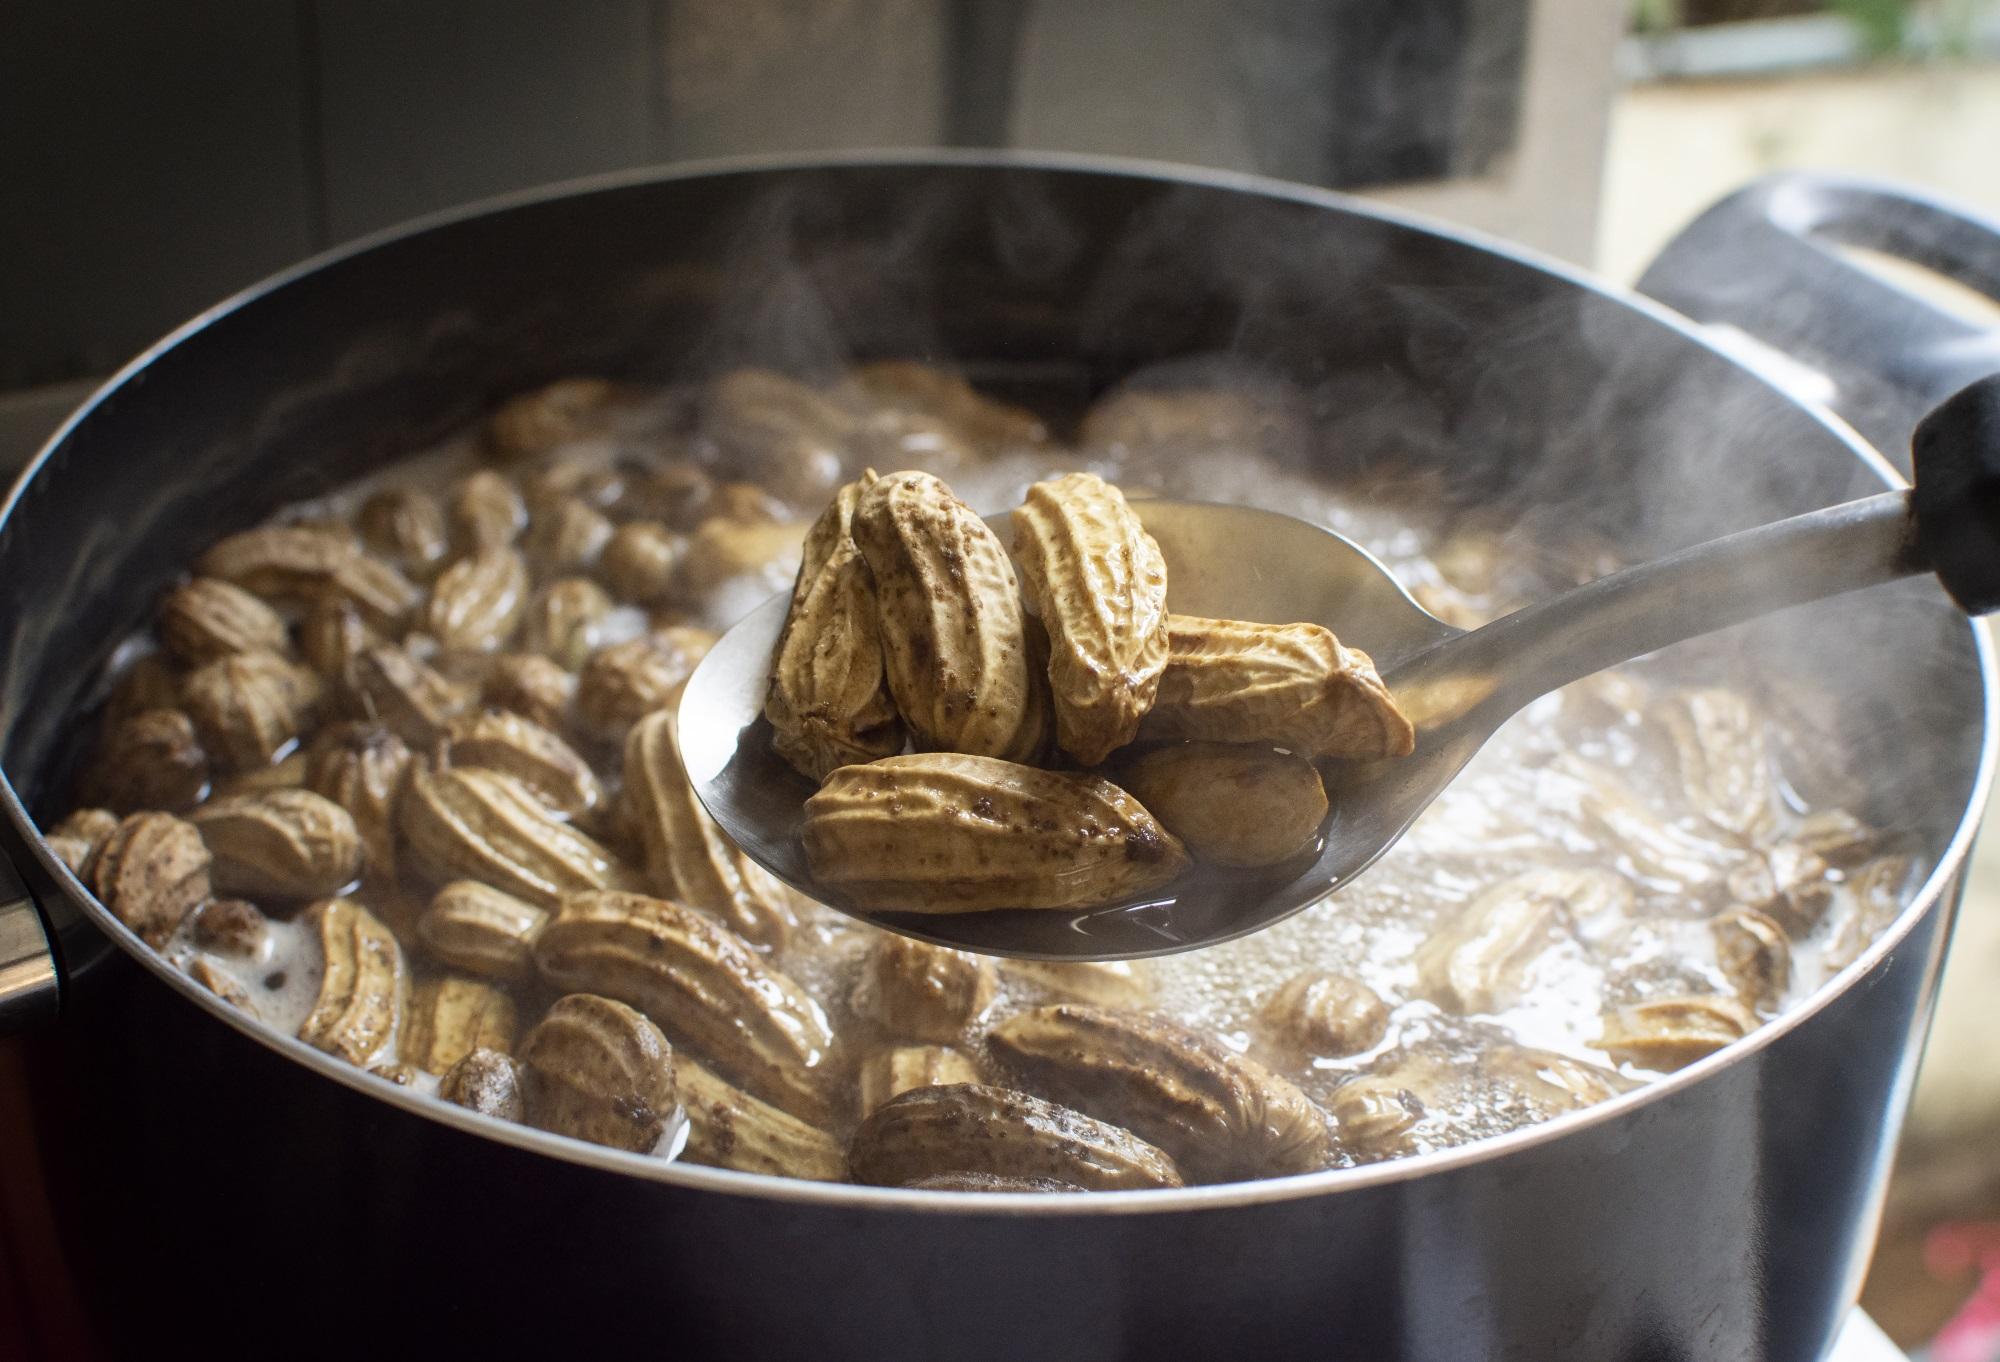 Boiled Peanut OIT Provides Sustained Desensitization in Peanut